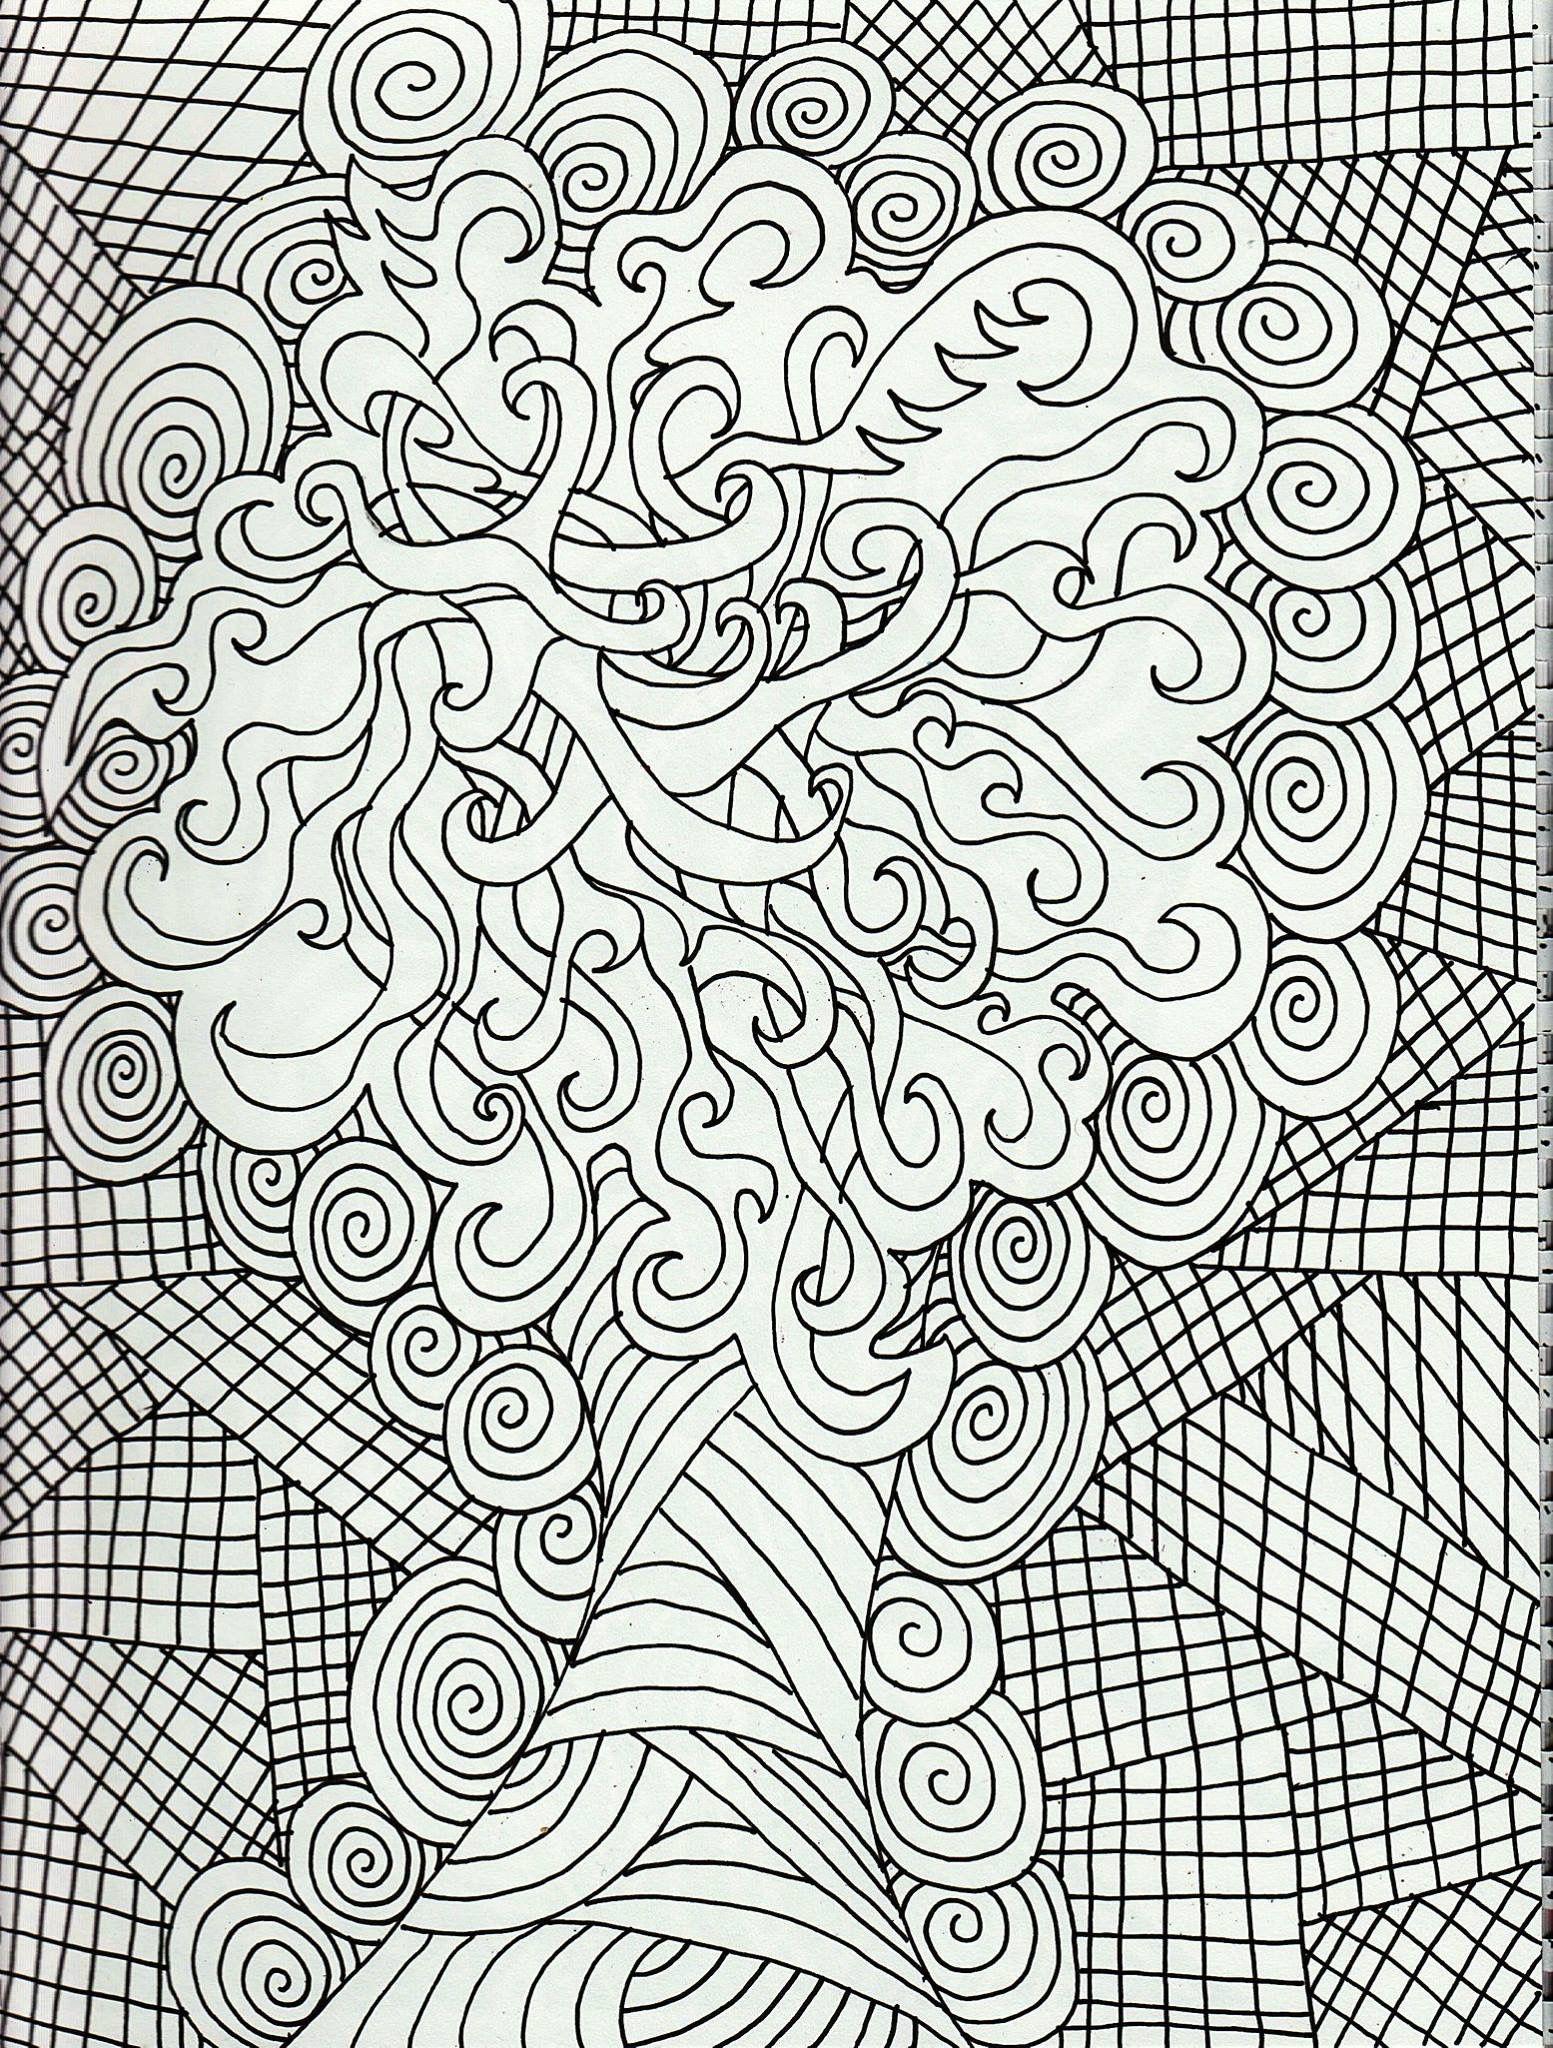 Pin On Desenhos Antiestresse